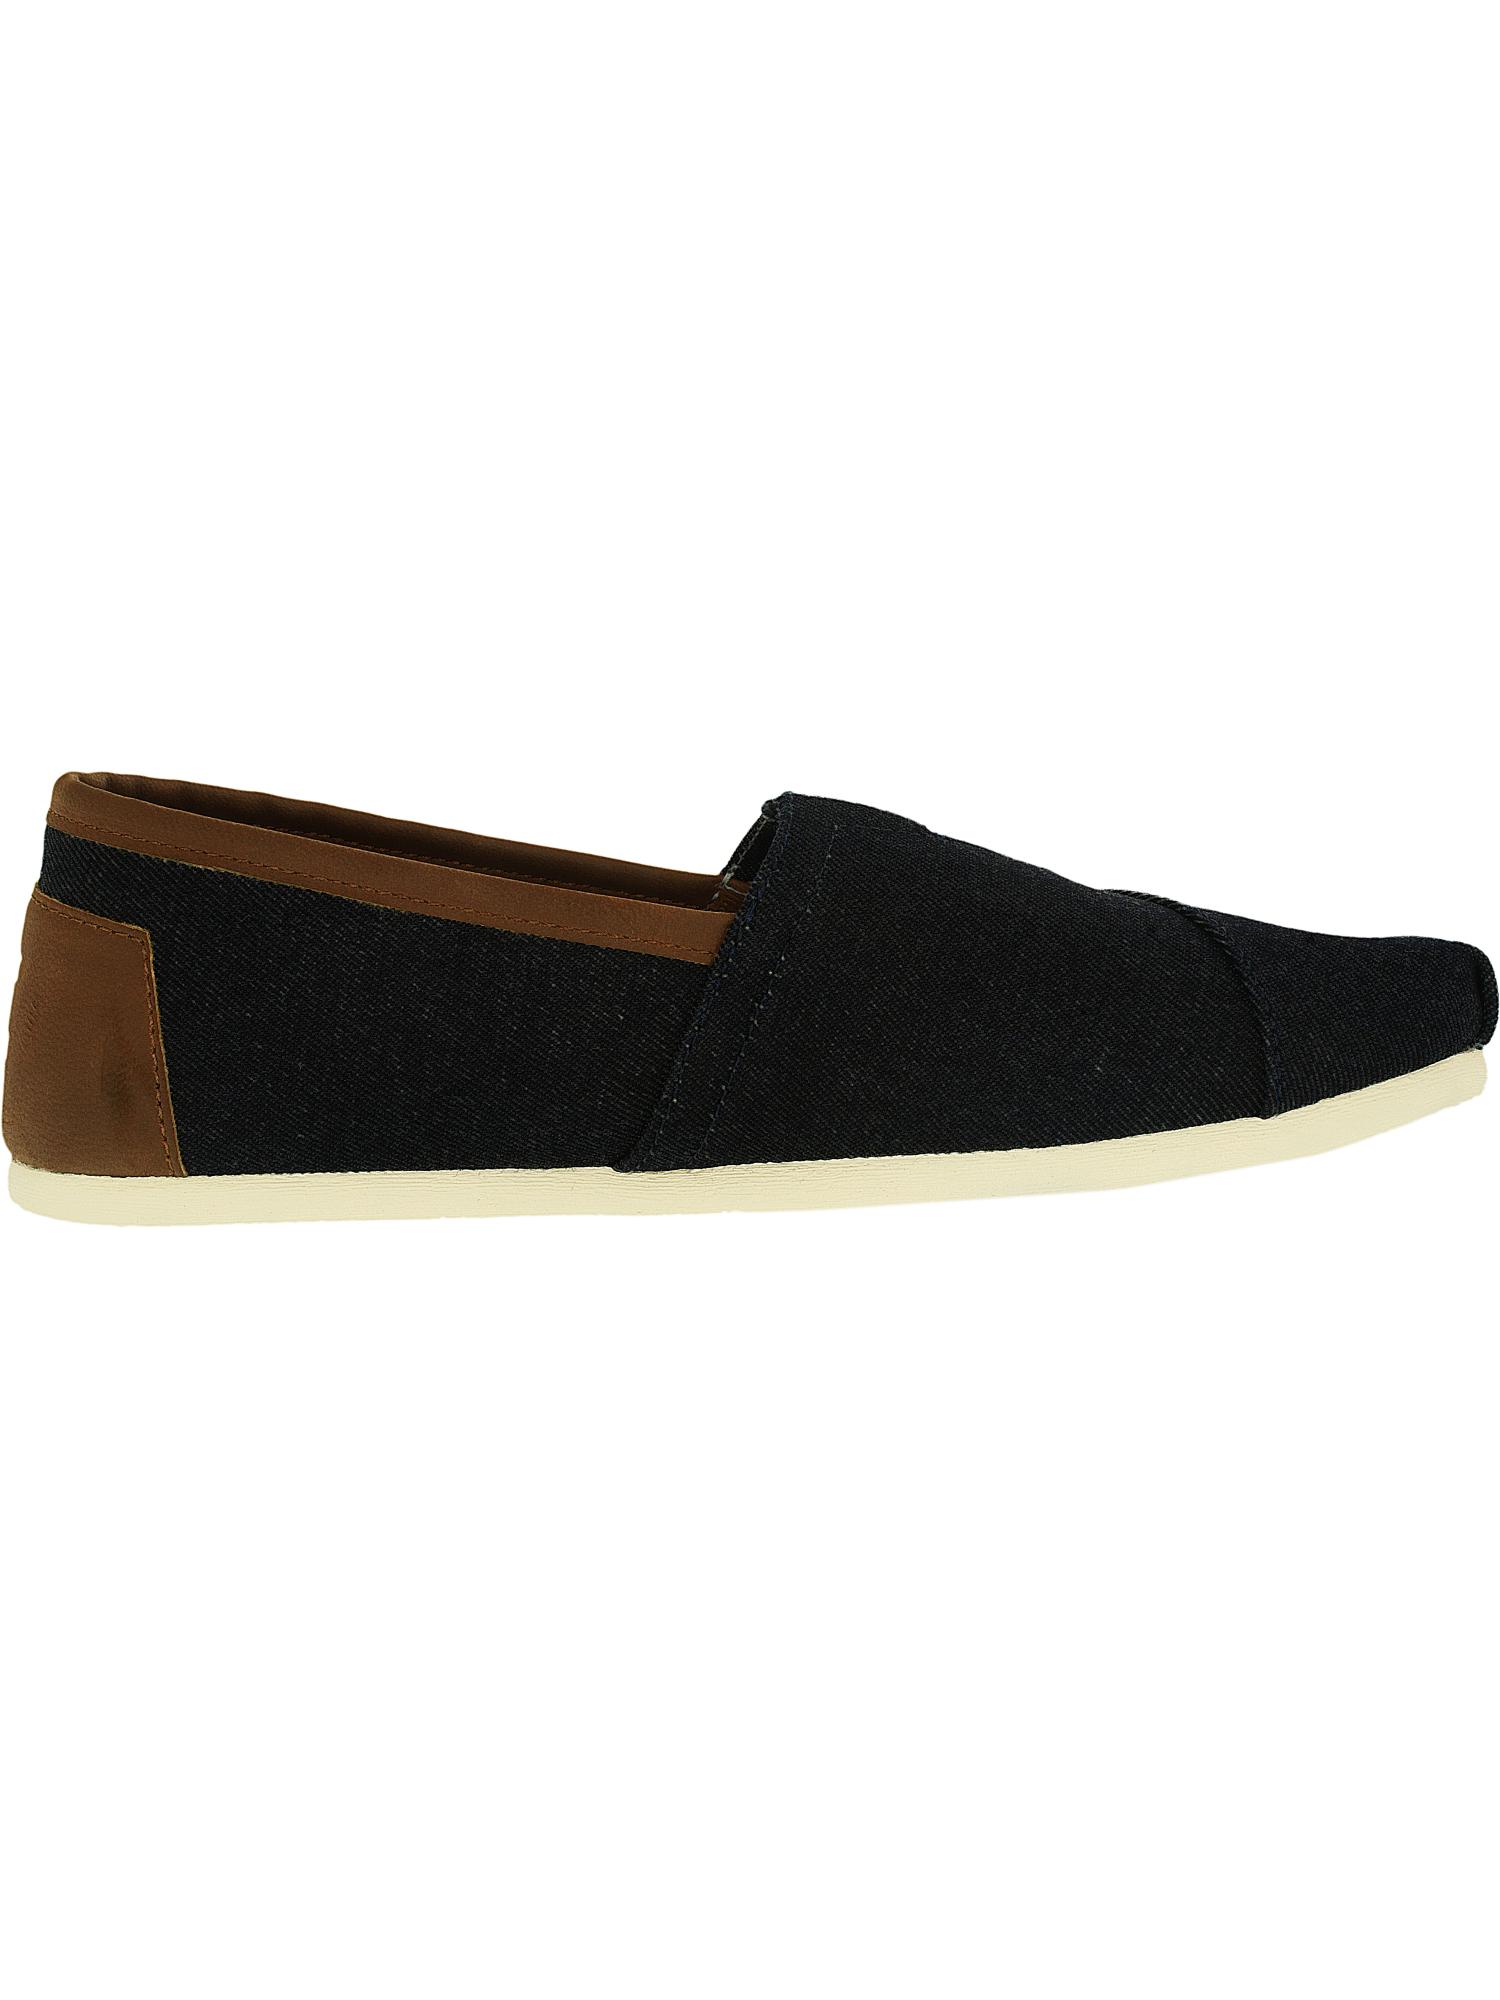 Toms-Men-039-s-Classic-Denim-Ankle-High-Canvas-Slip-On-Shoes thumbnail 5